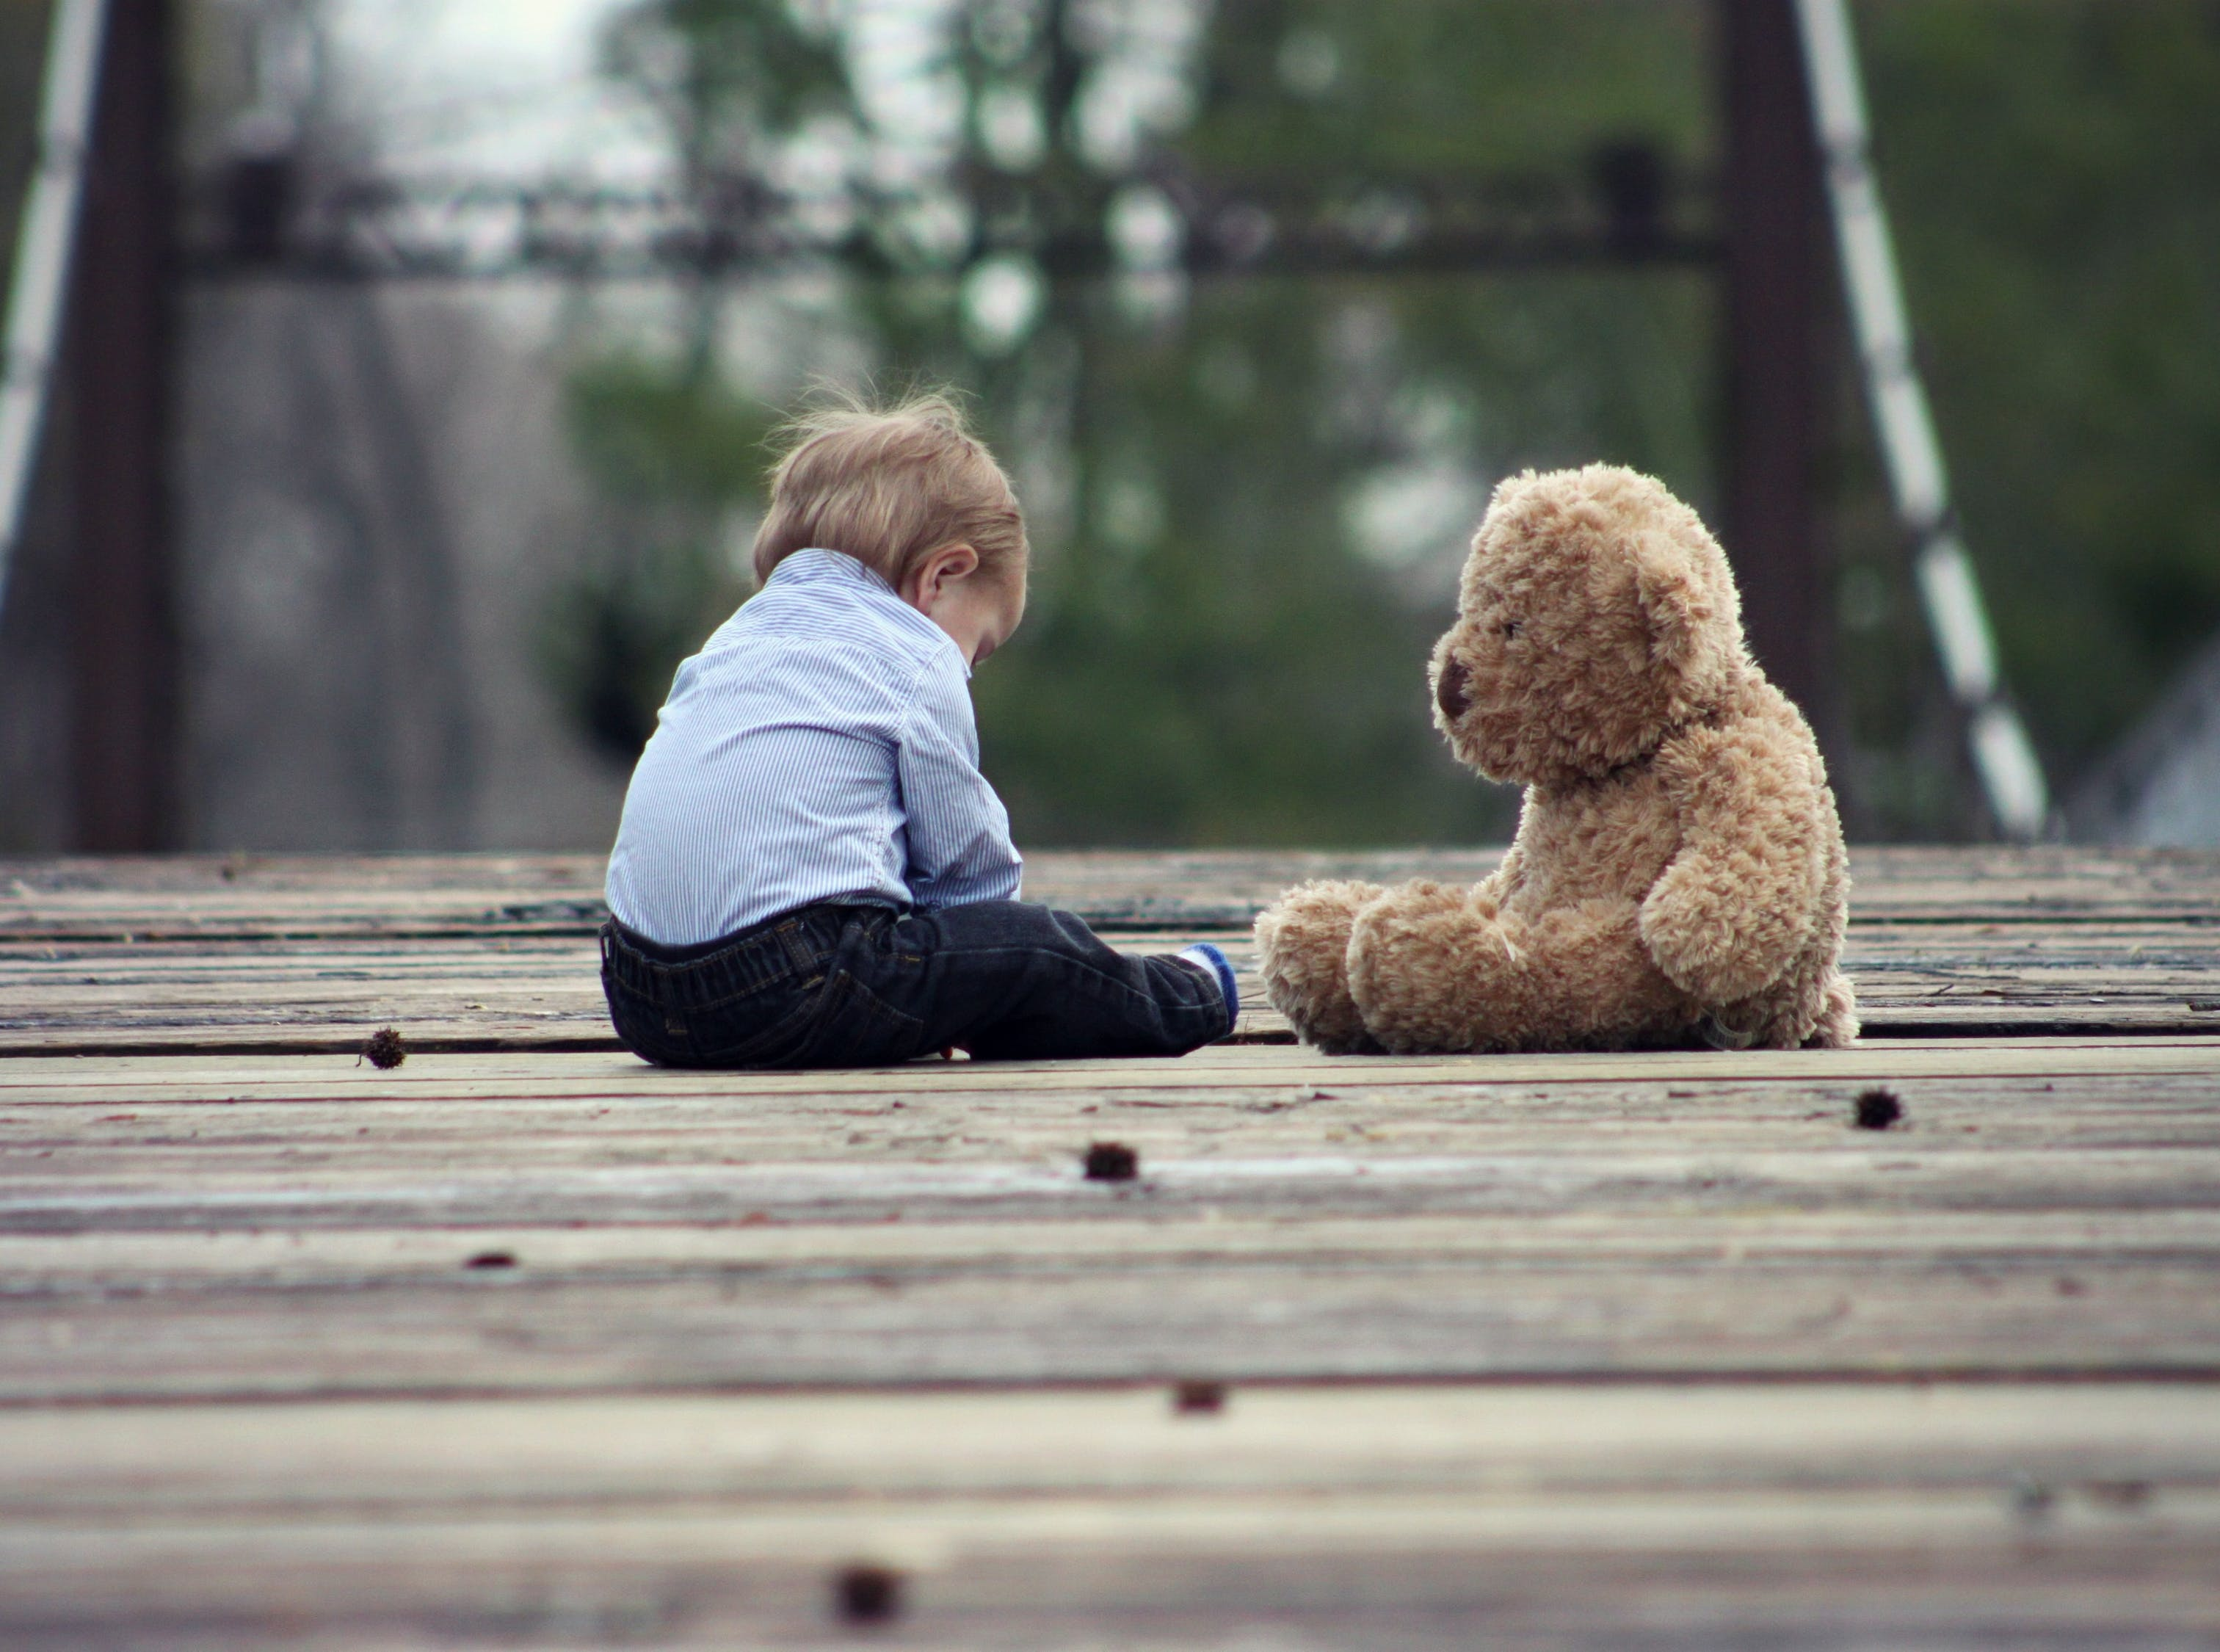 baby-teddy-bear-cute